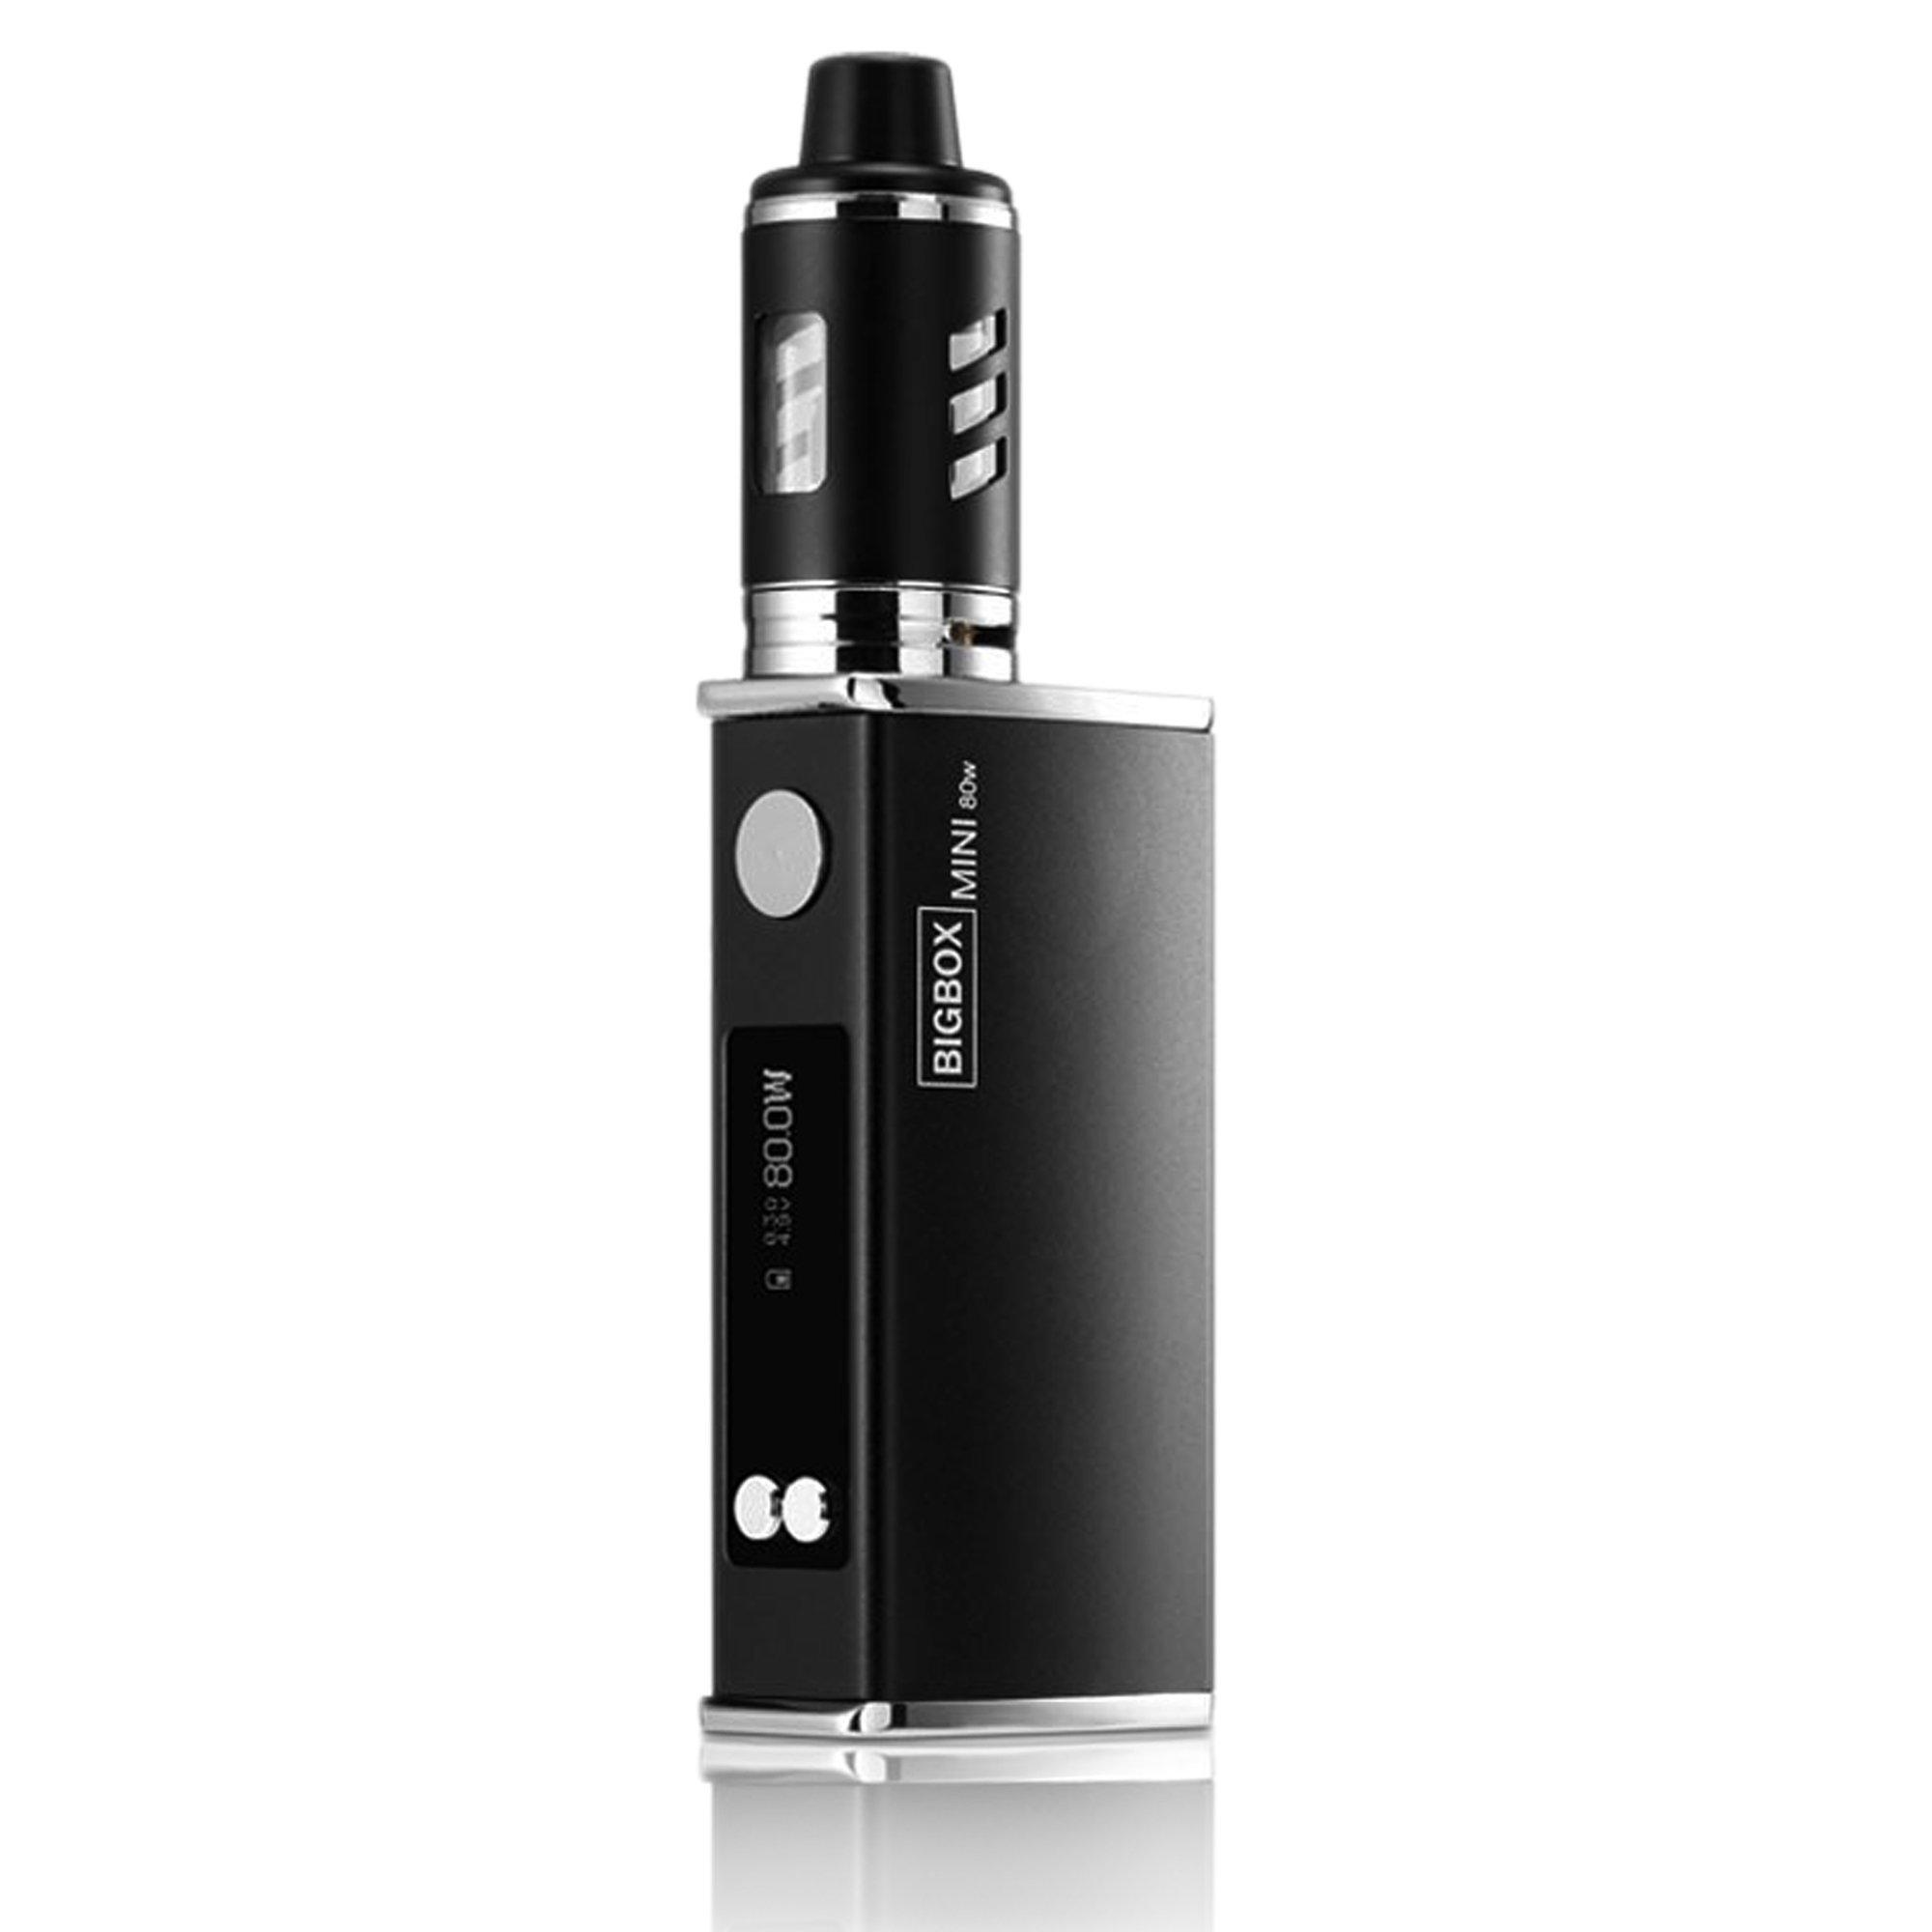 [E ZIGARETTE] Starterset- 80W - E Shisha Box Mod kit-2200mAH Akku-Regelbare Watt OLED Bildschirm-2.8ml Verdampfer kopf Tank-Elektronische Zigarette-E Vape-Vaperviper